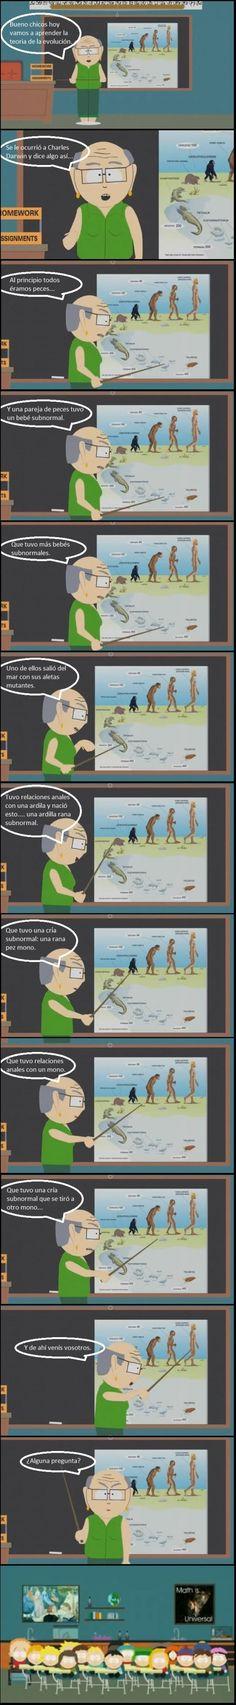 La teoria de la evolucion Laughter, Humor, Humour, Moon Moon, Funny Humor, Rice, Lifting Humor, Chistes, Funny Jokes